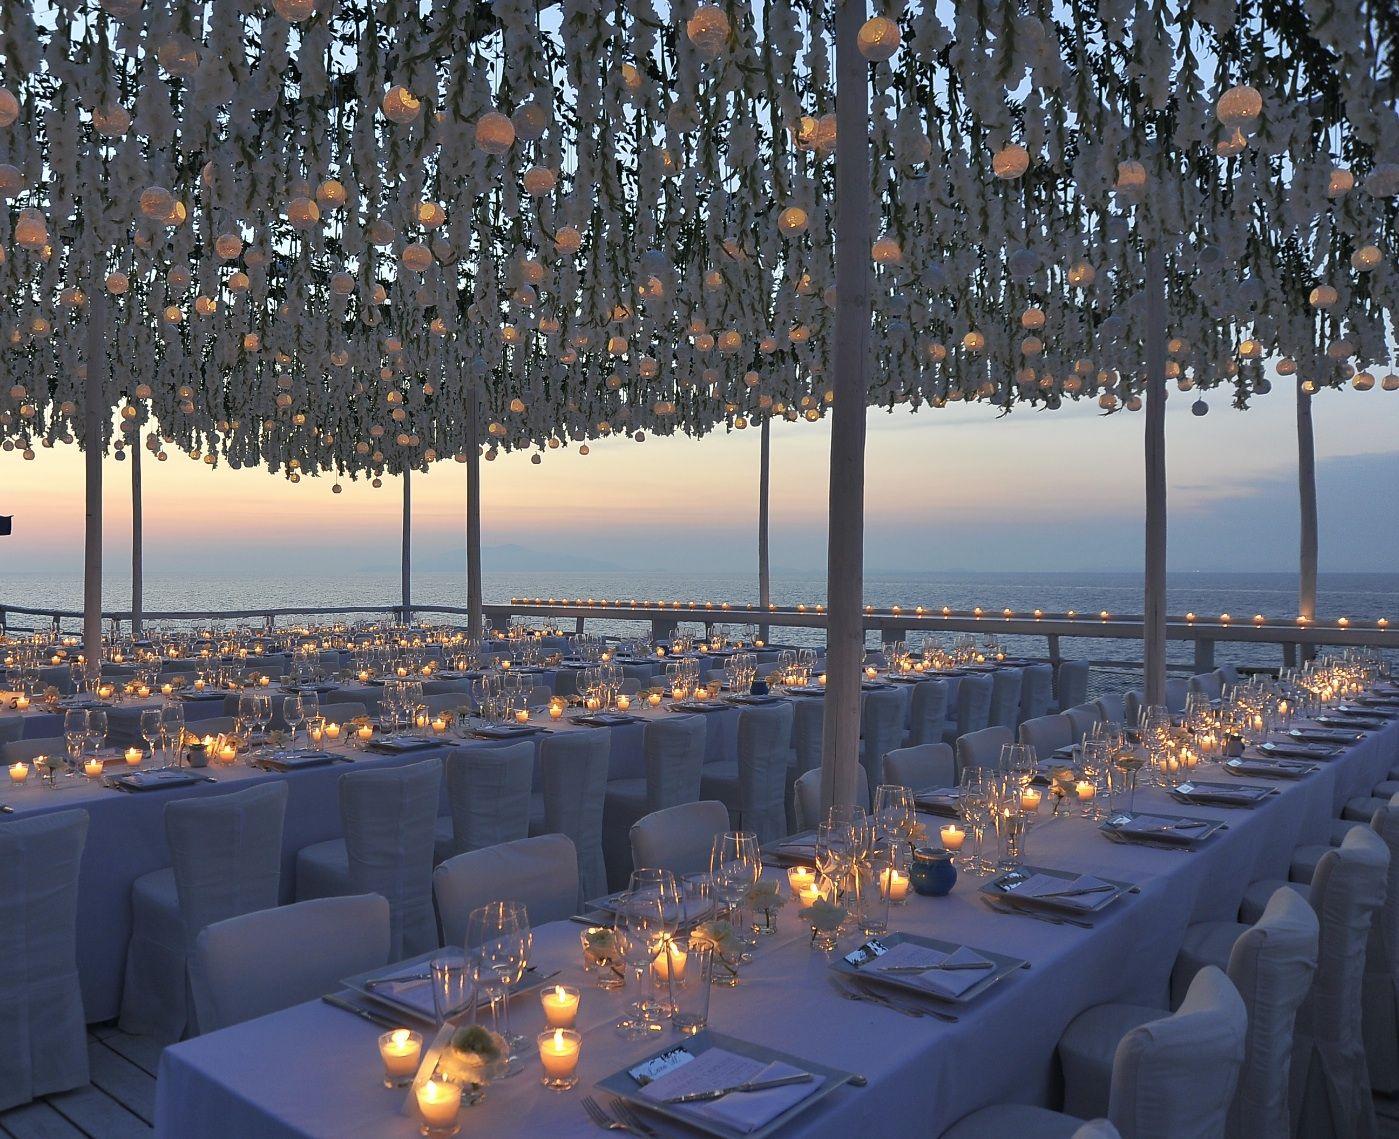 Contemporary White Wedding In Capri Italy Designed By Diana Sorensen For Sugokuii Events